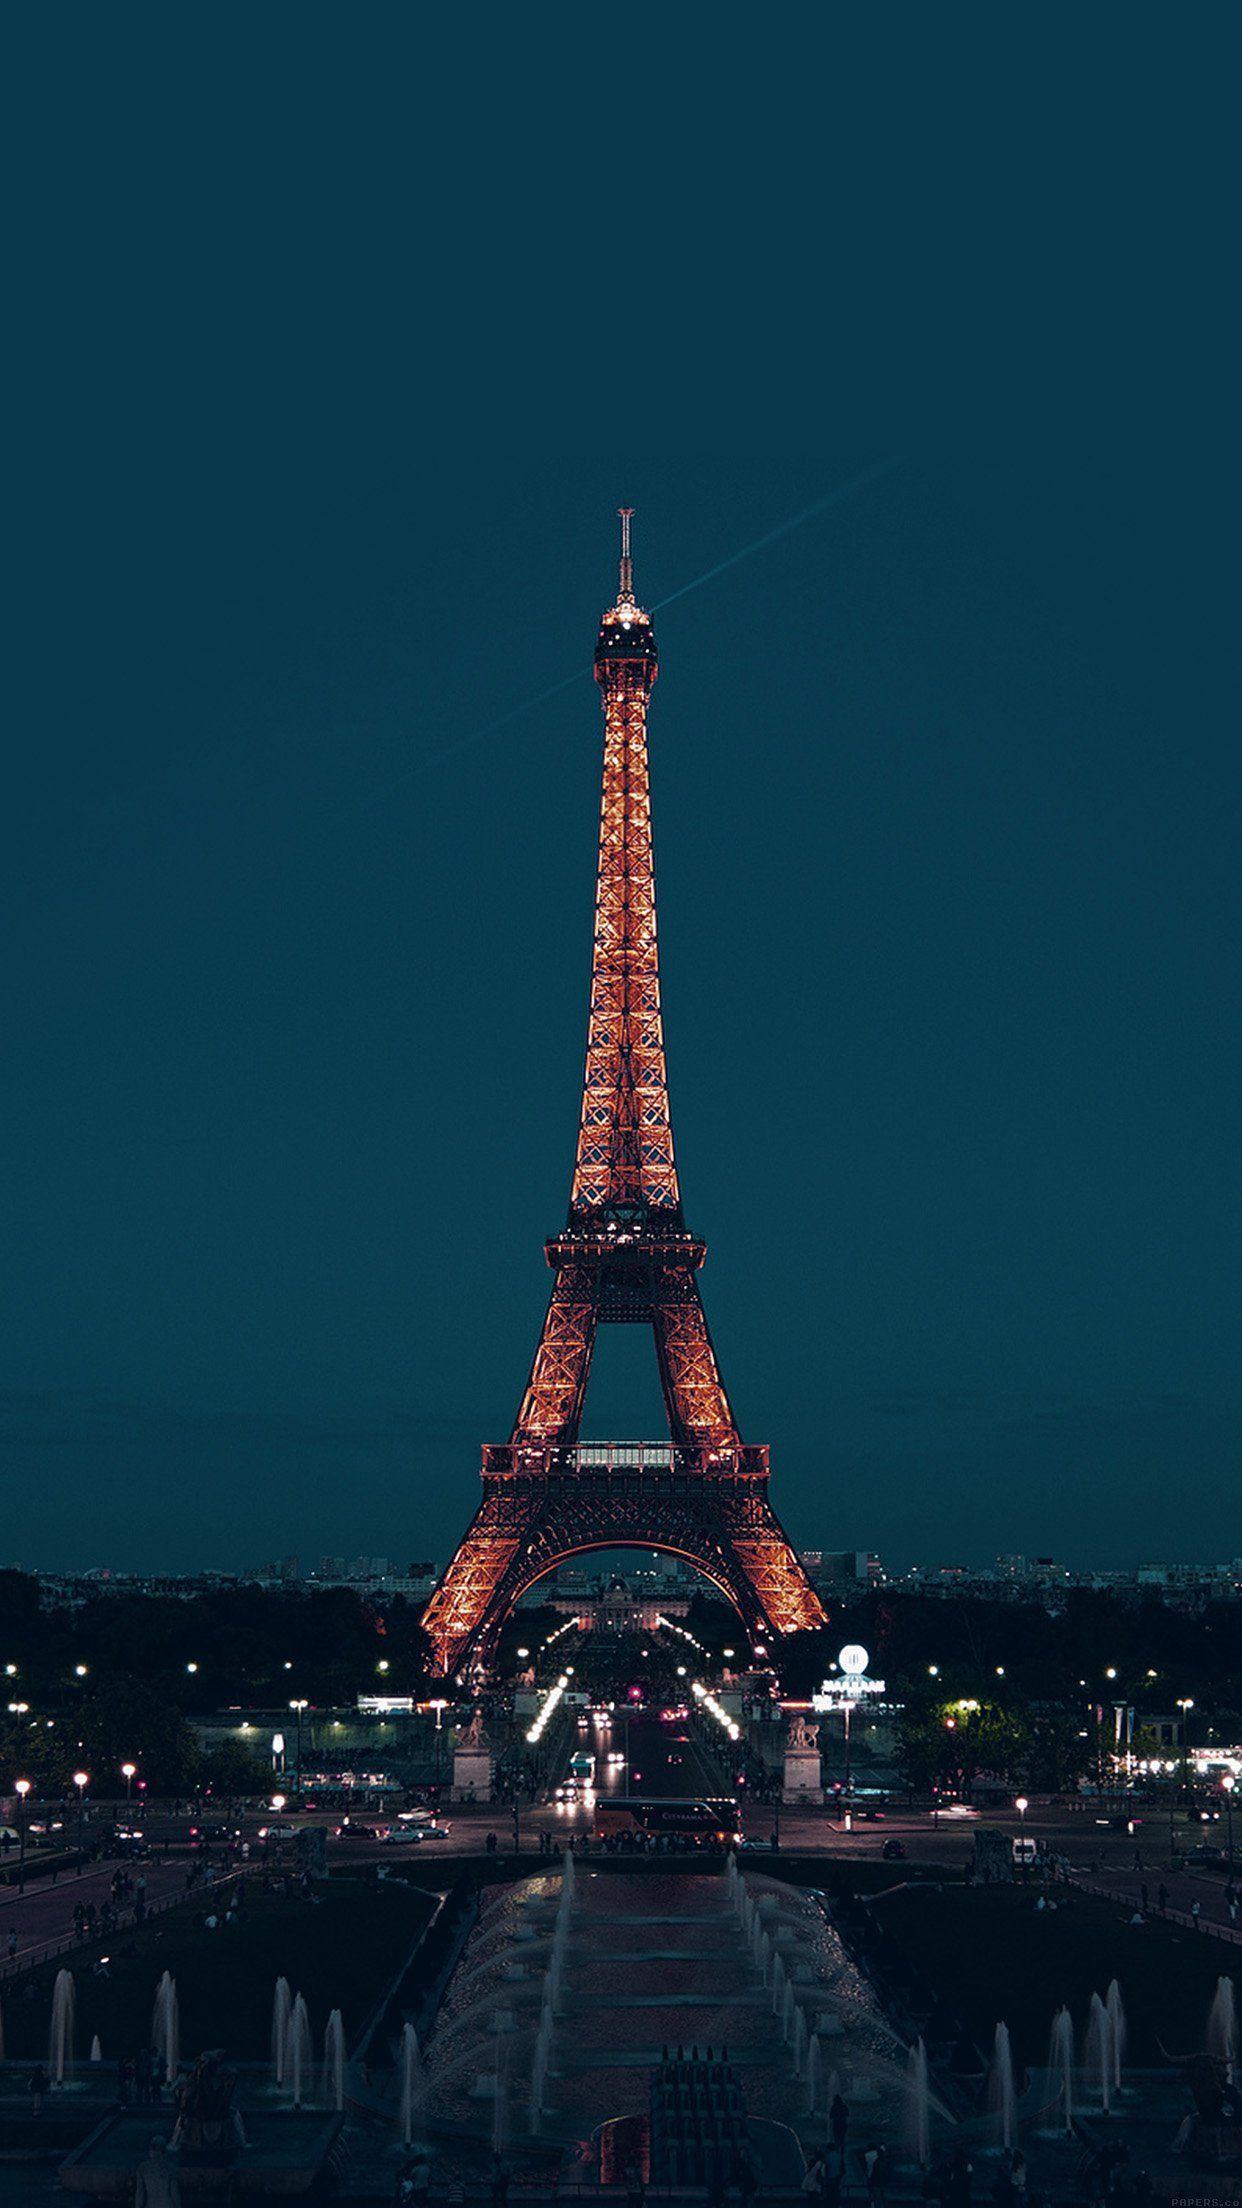 Paris Iphone Wallpapers Top Free Paris Iphone Backgrounds Wallpaperaccess